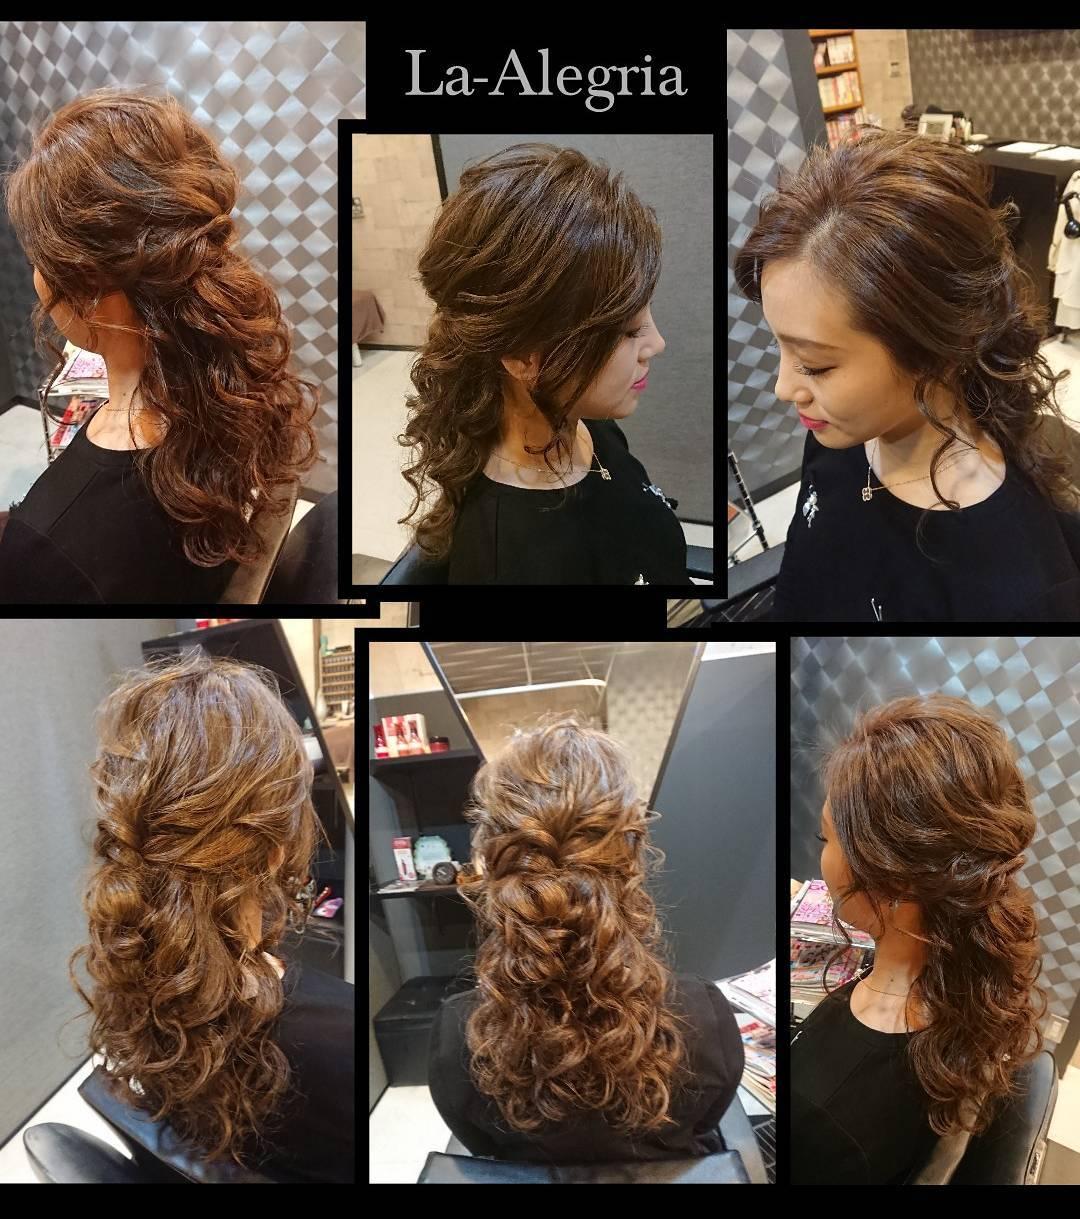 http://beauty-salon-la-alegria-ubecity.com/news/320.jpg